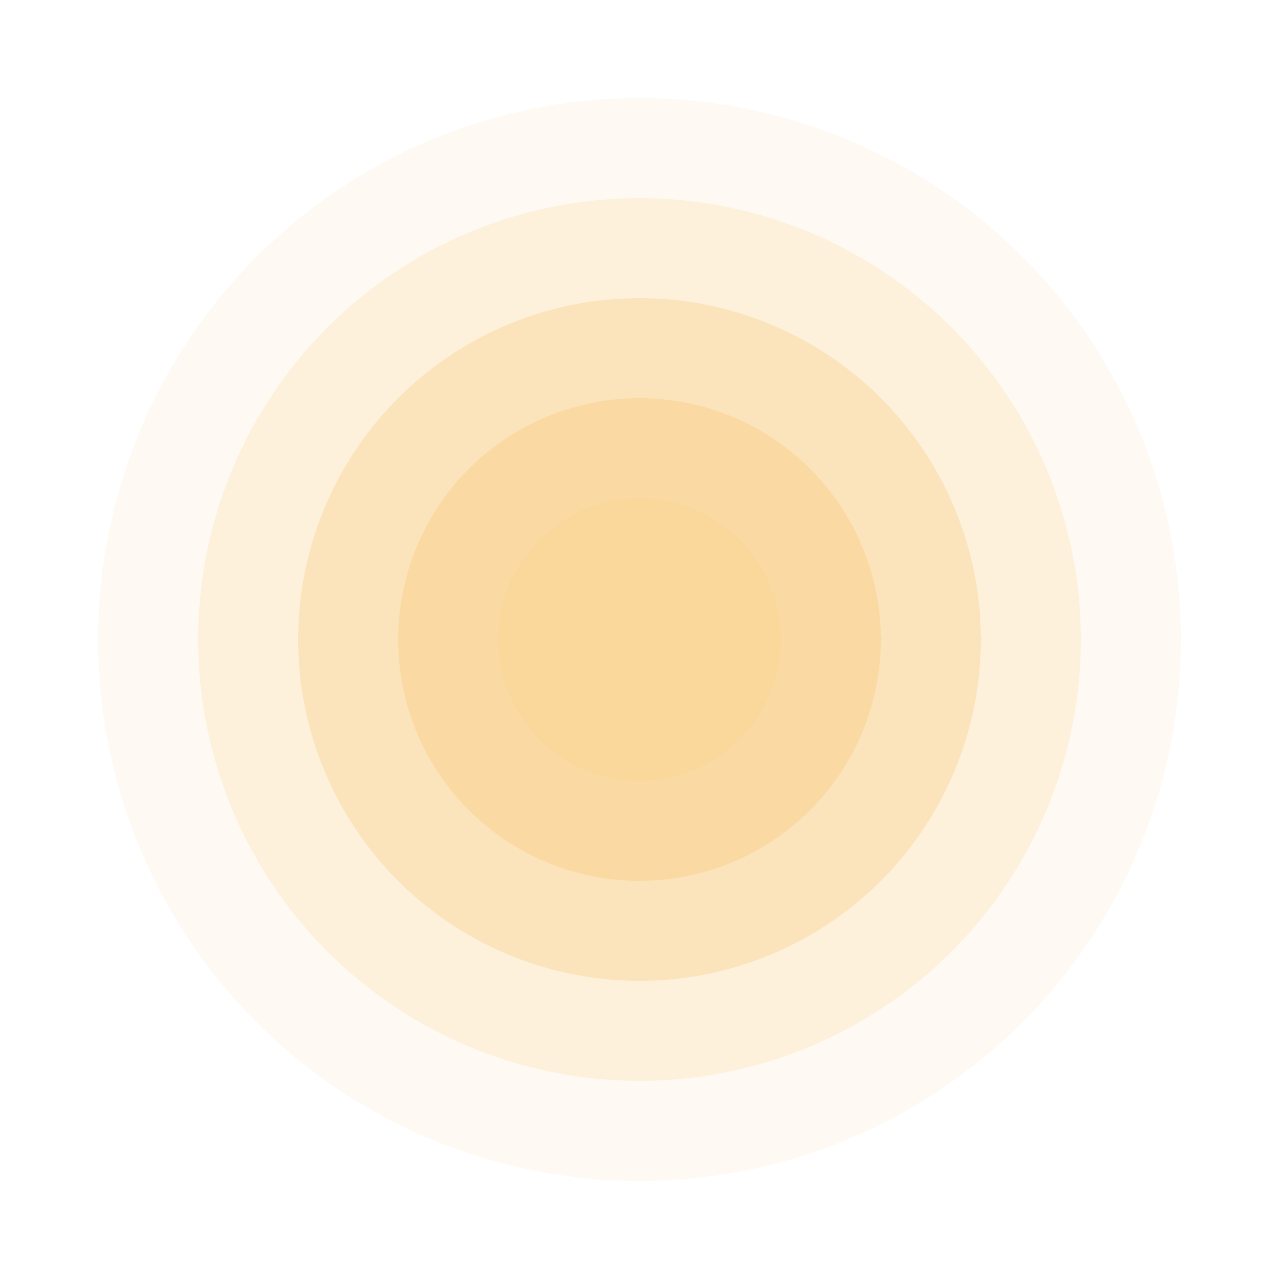 Colorful Circle 17599 Logodesign Circle Color Textured Background